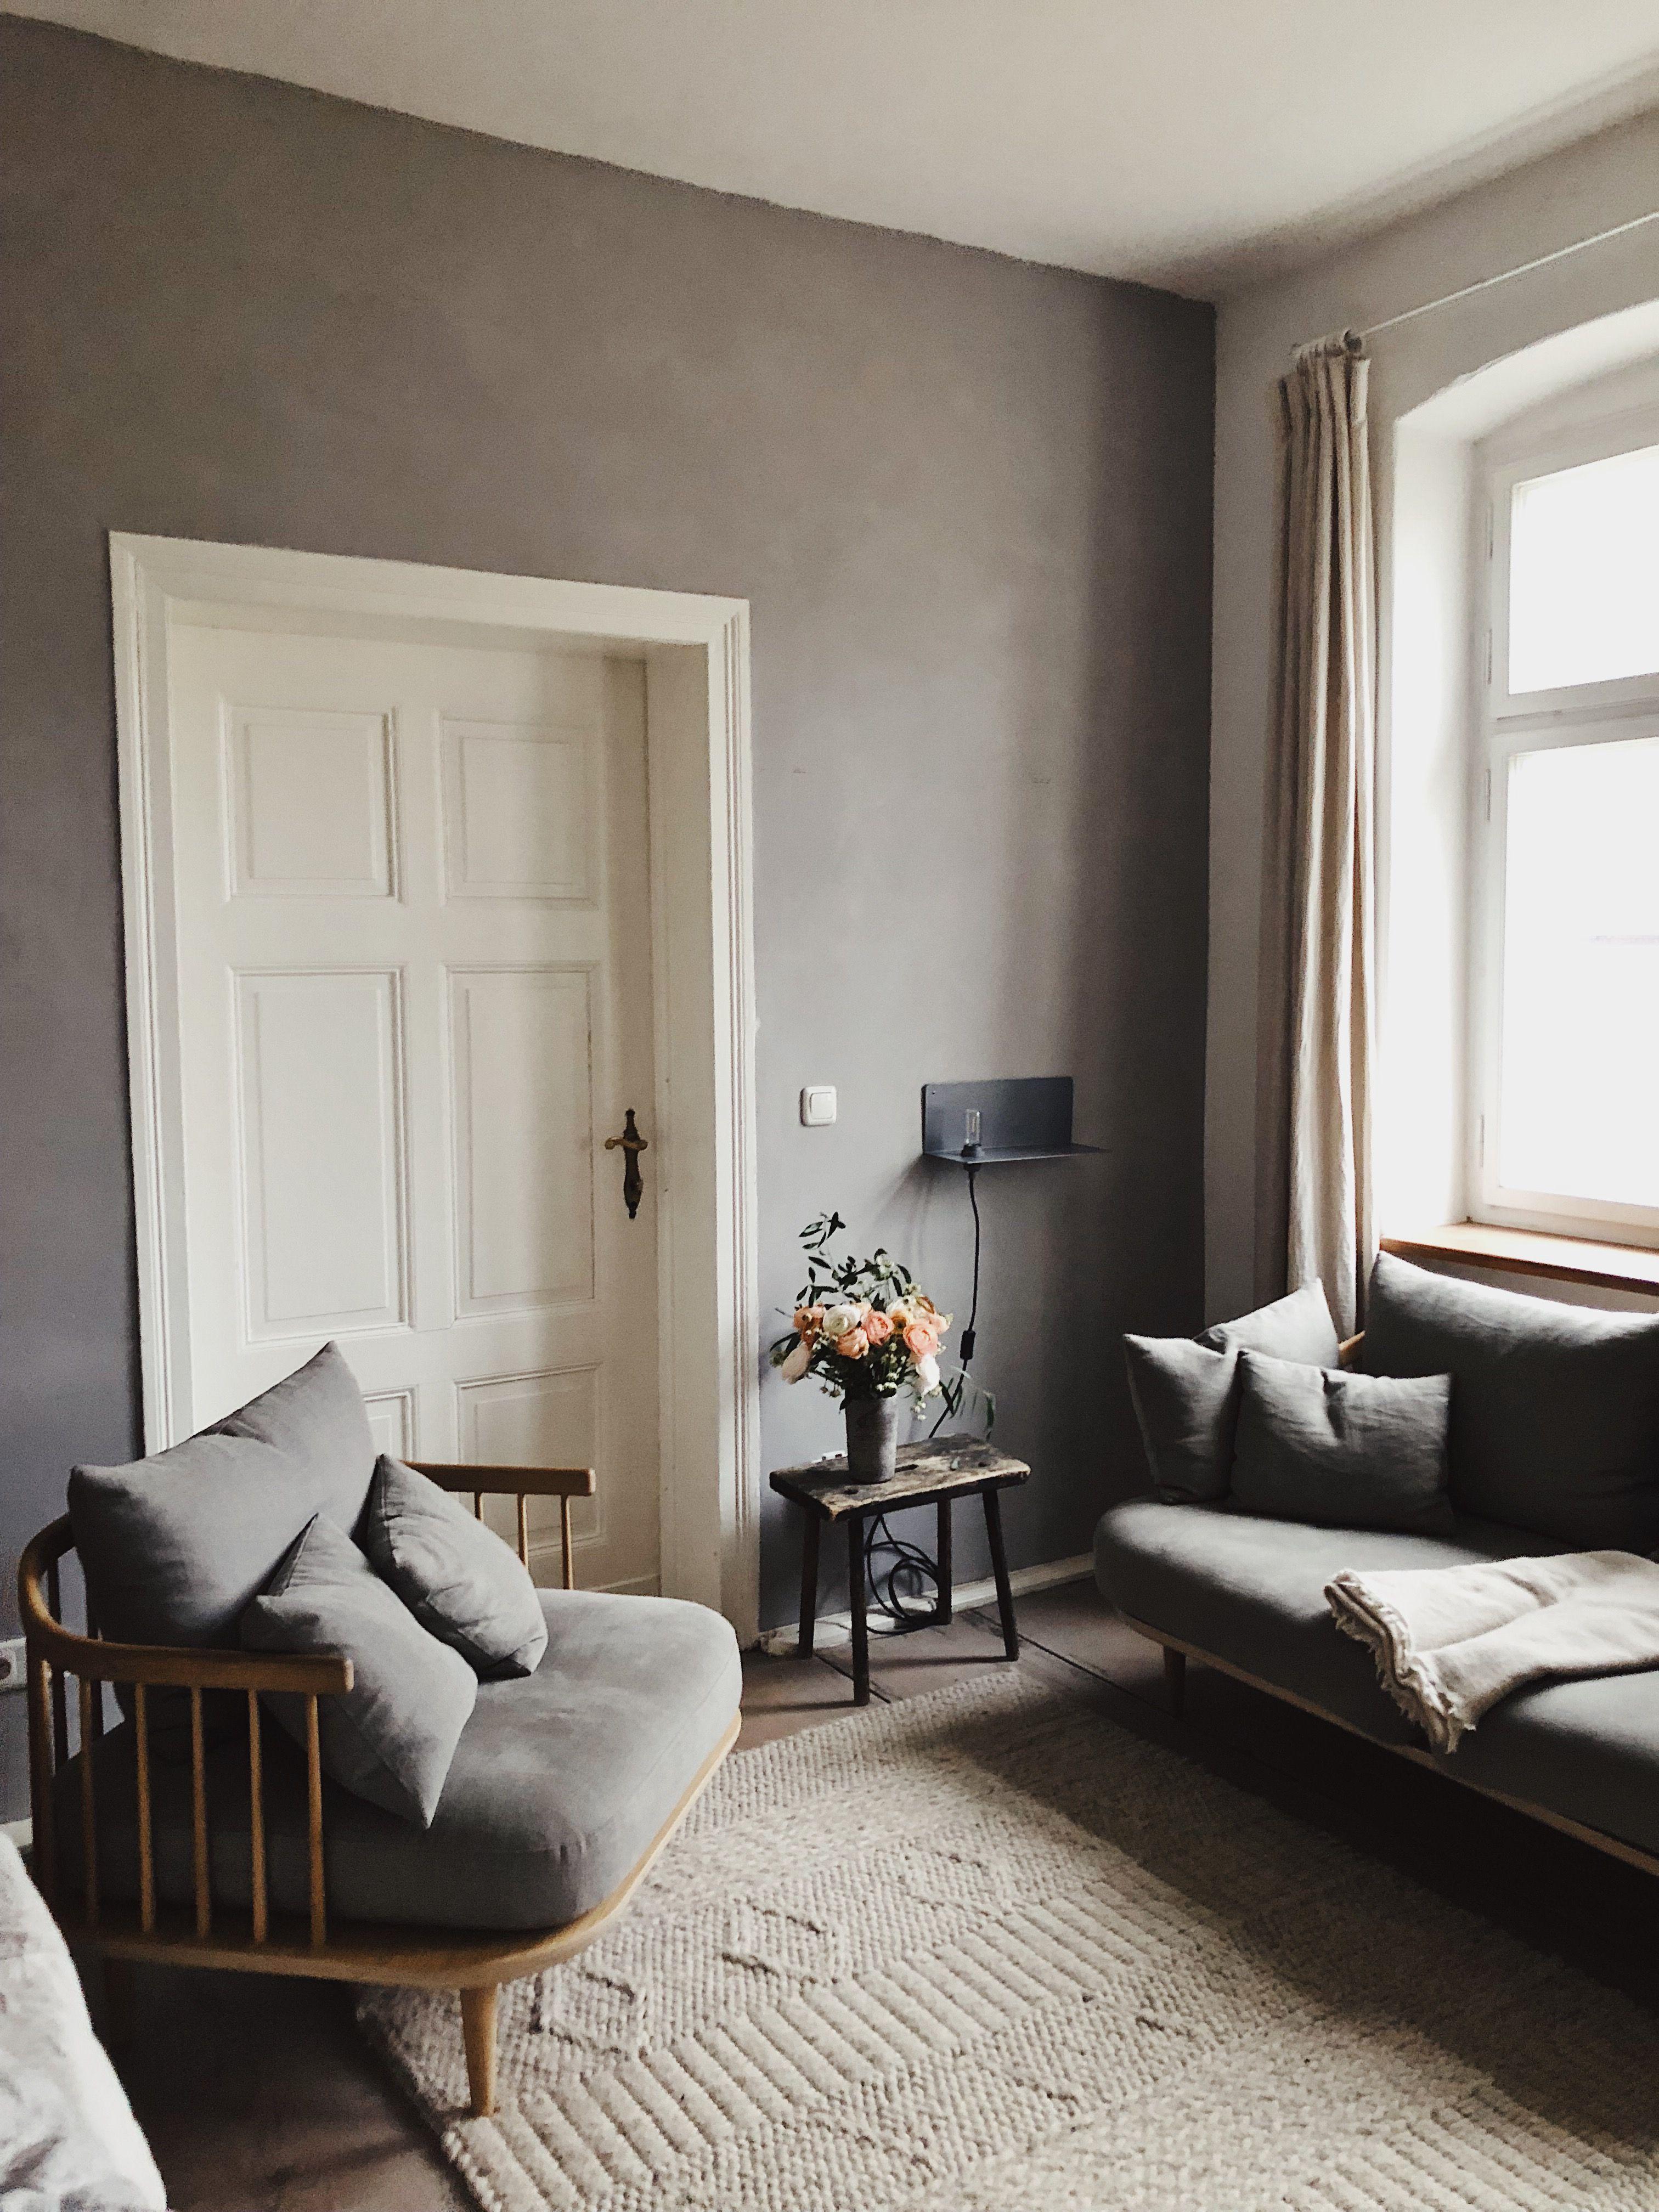 Tradition Fly Sofa And Chair Scandinavian Interior Livingroom Inspo Living Room Scandinavian Living Room Interior Home #scandinavian #living #room #chair